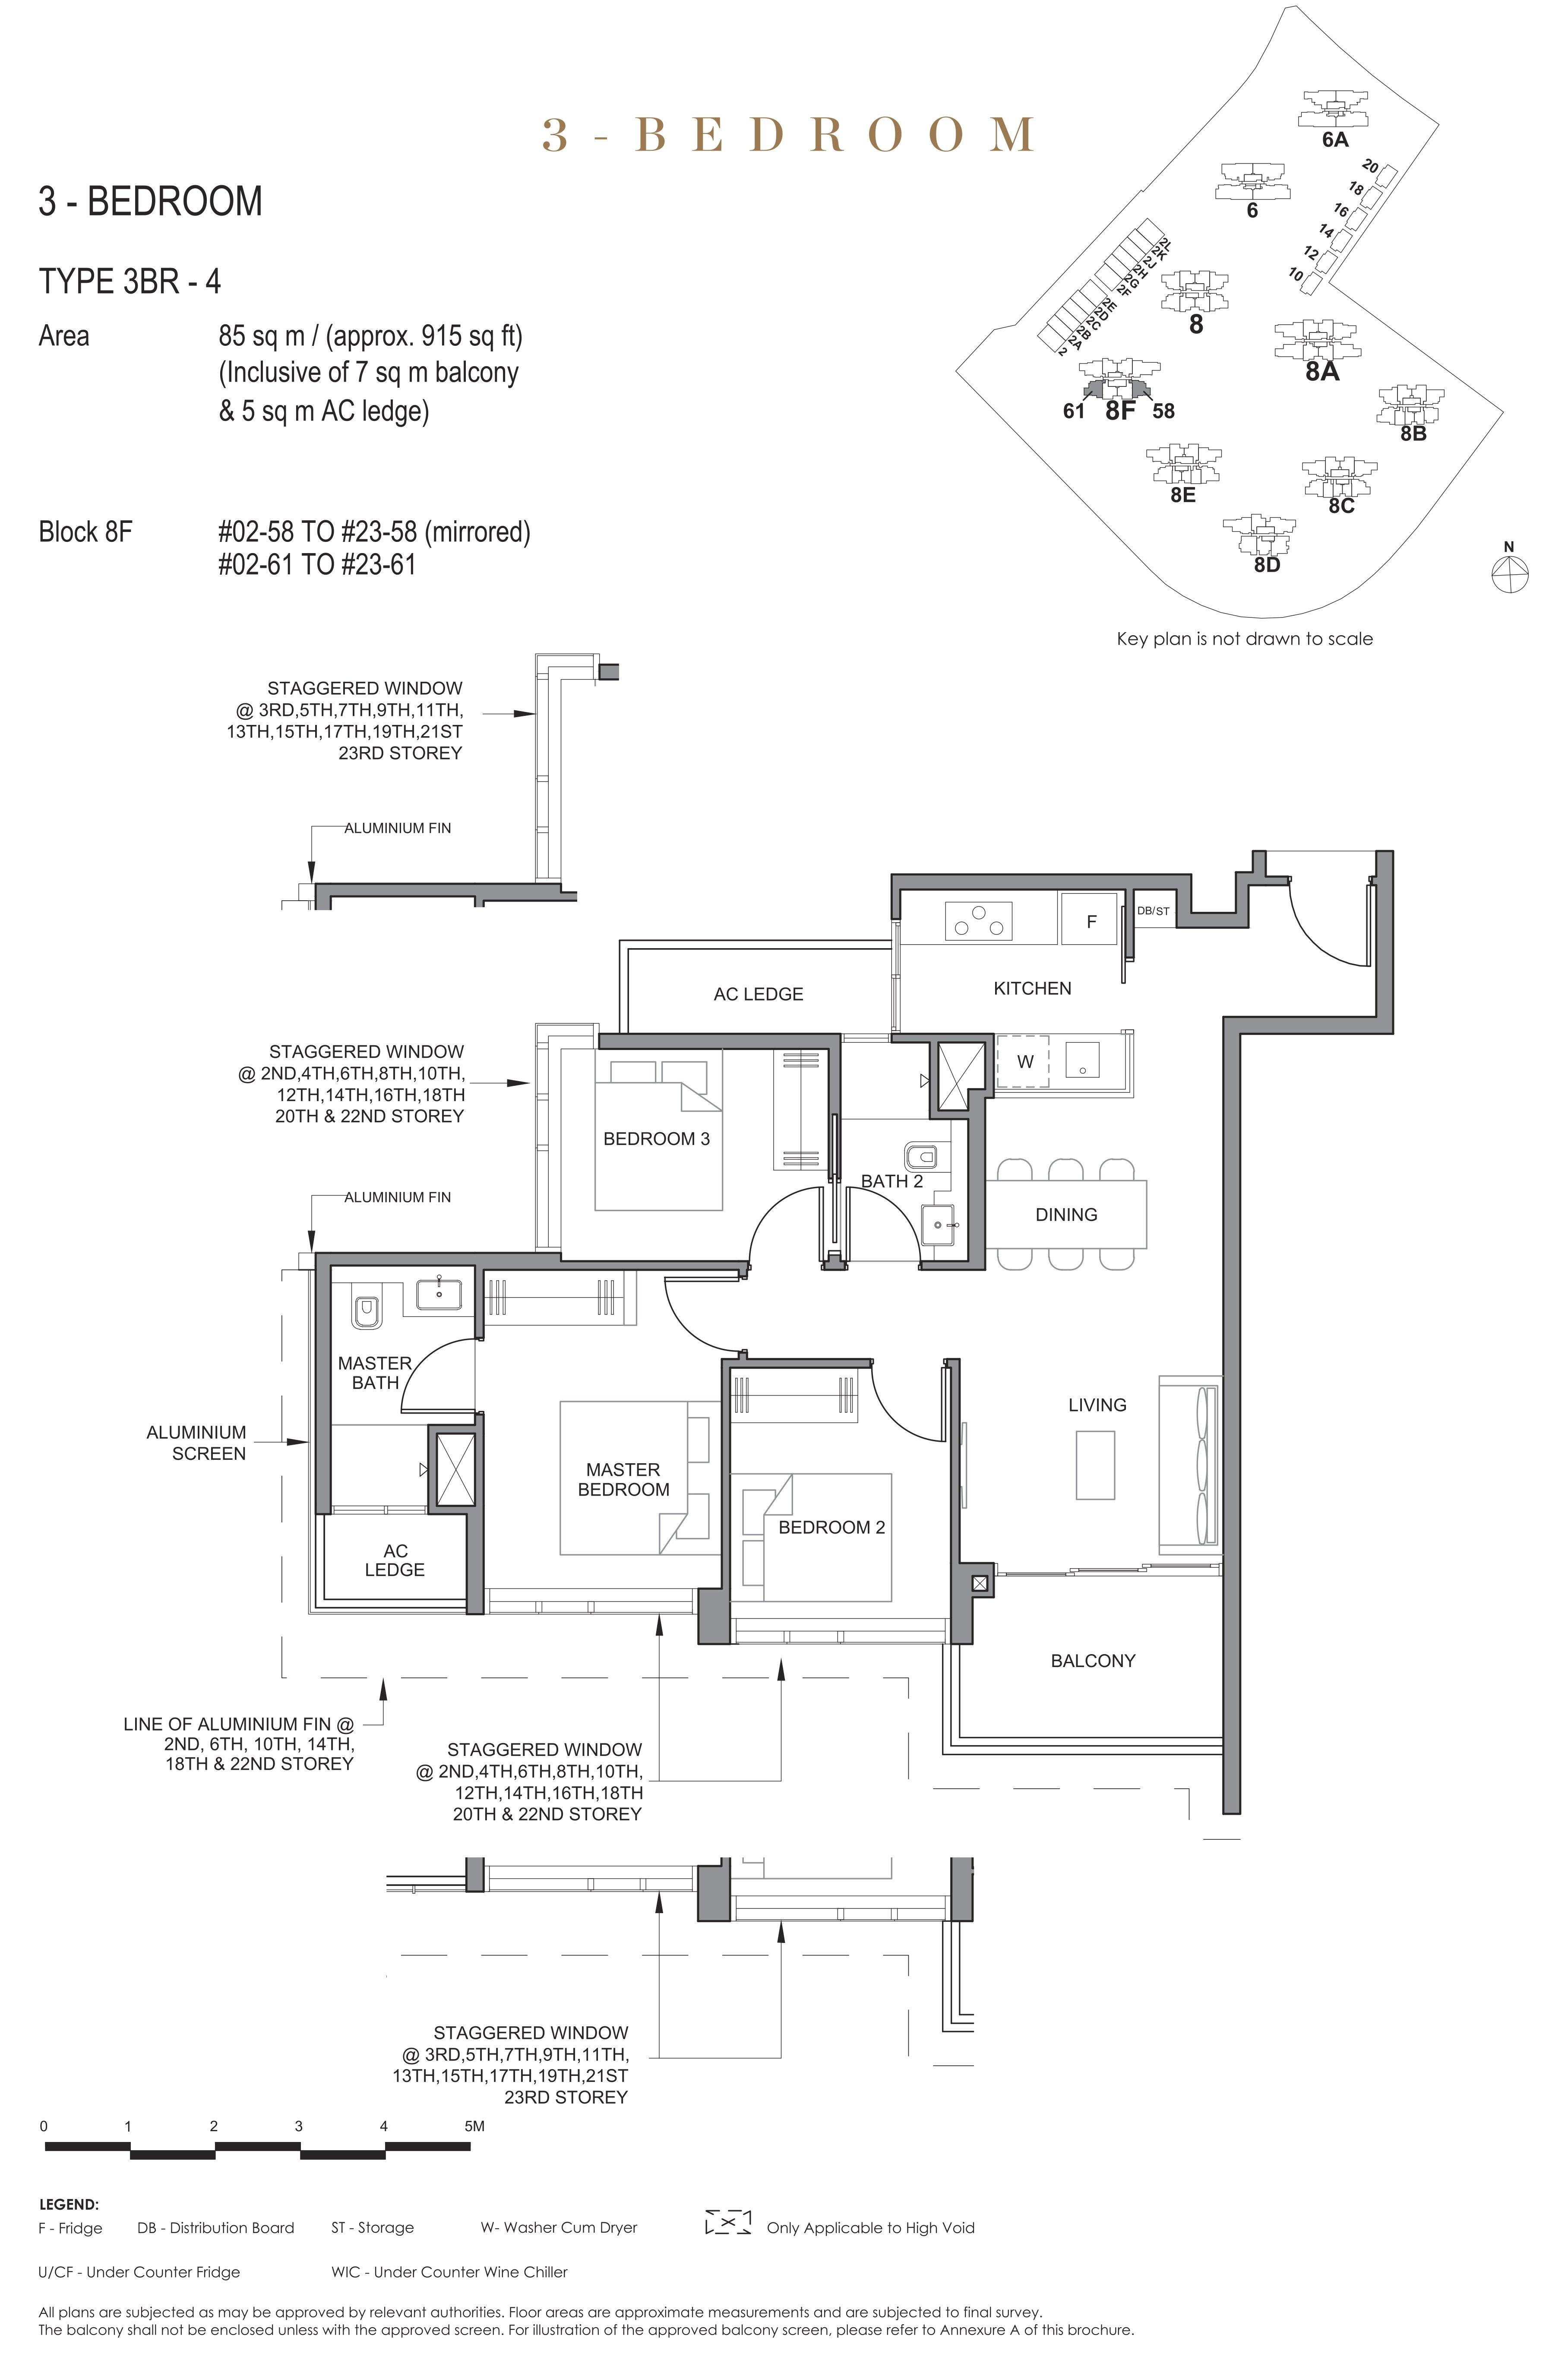 Parc Clematis 锦泰门第 elegance 3 bedroom 3卧房 3BR-4